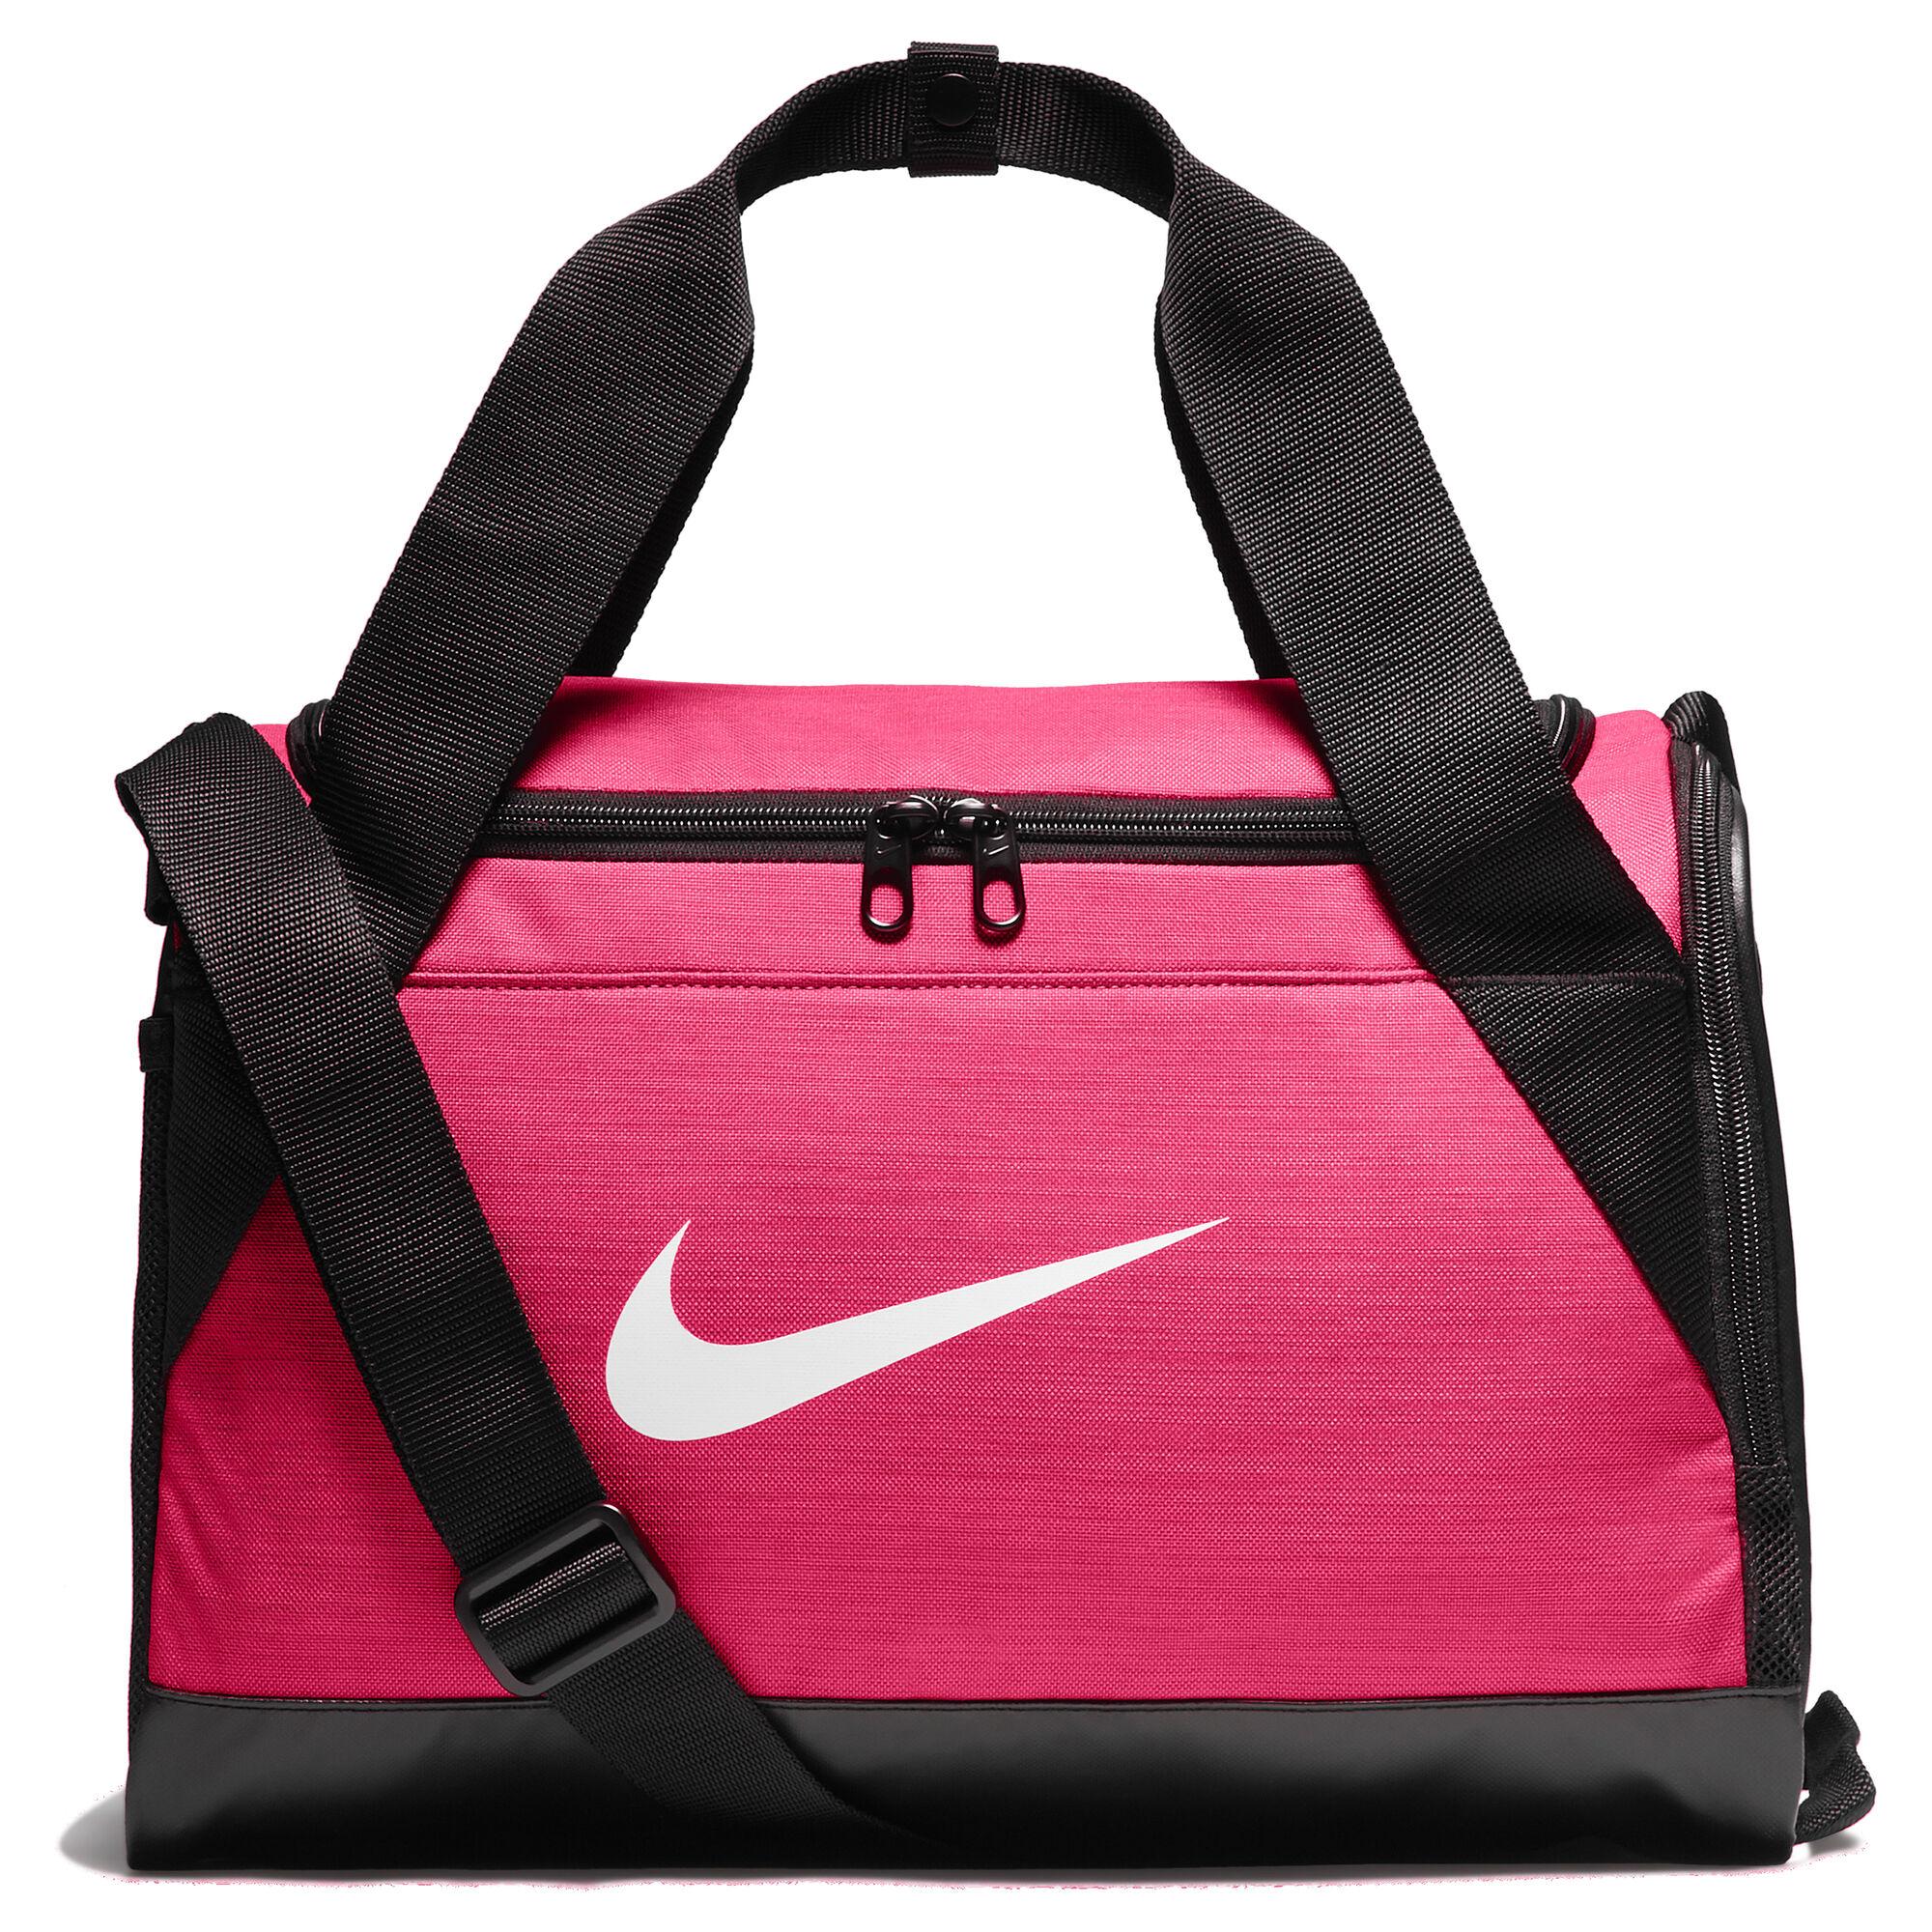 496cd0b6b8 Nike Brasilia Duffel Extra Small Sac De Sport XS - Pink , Noir ...